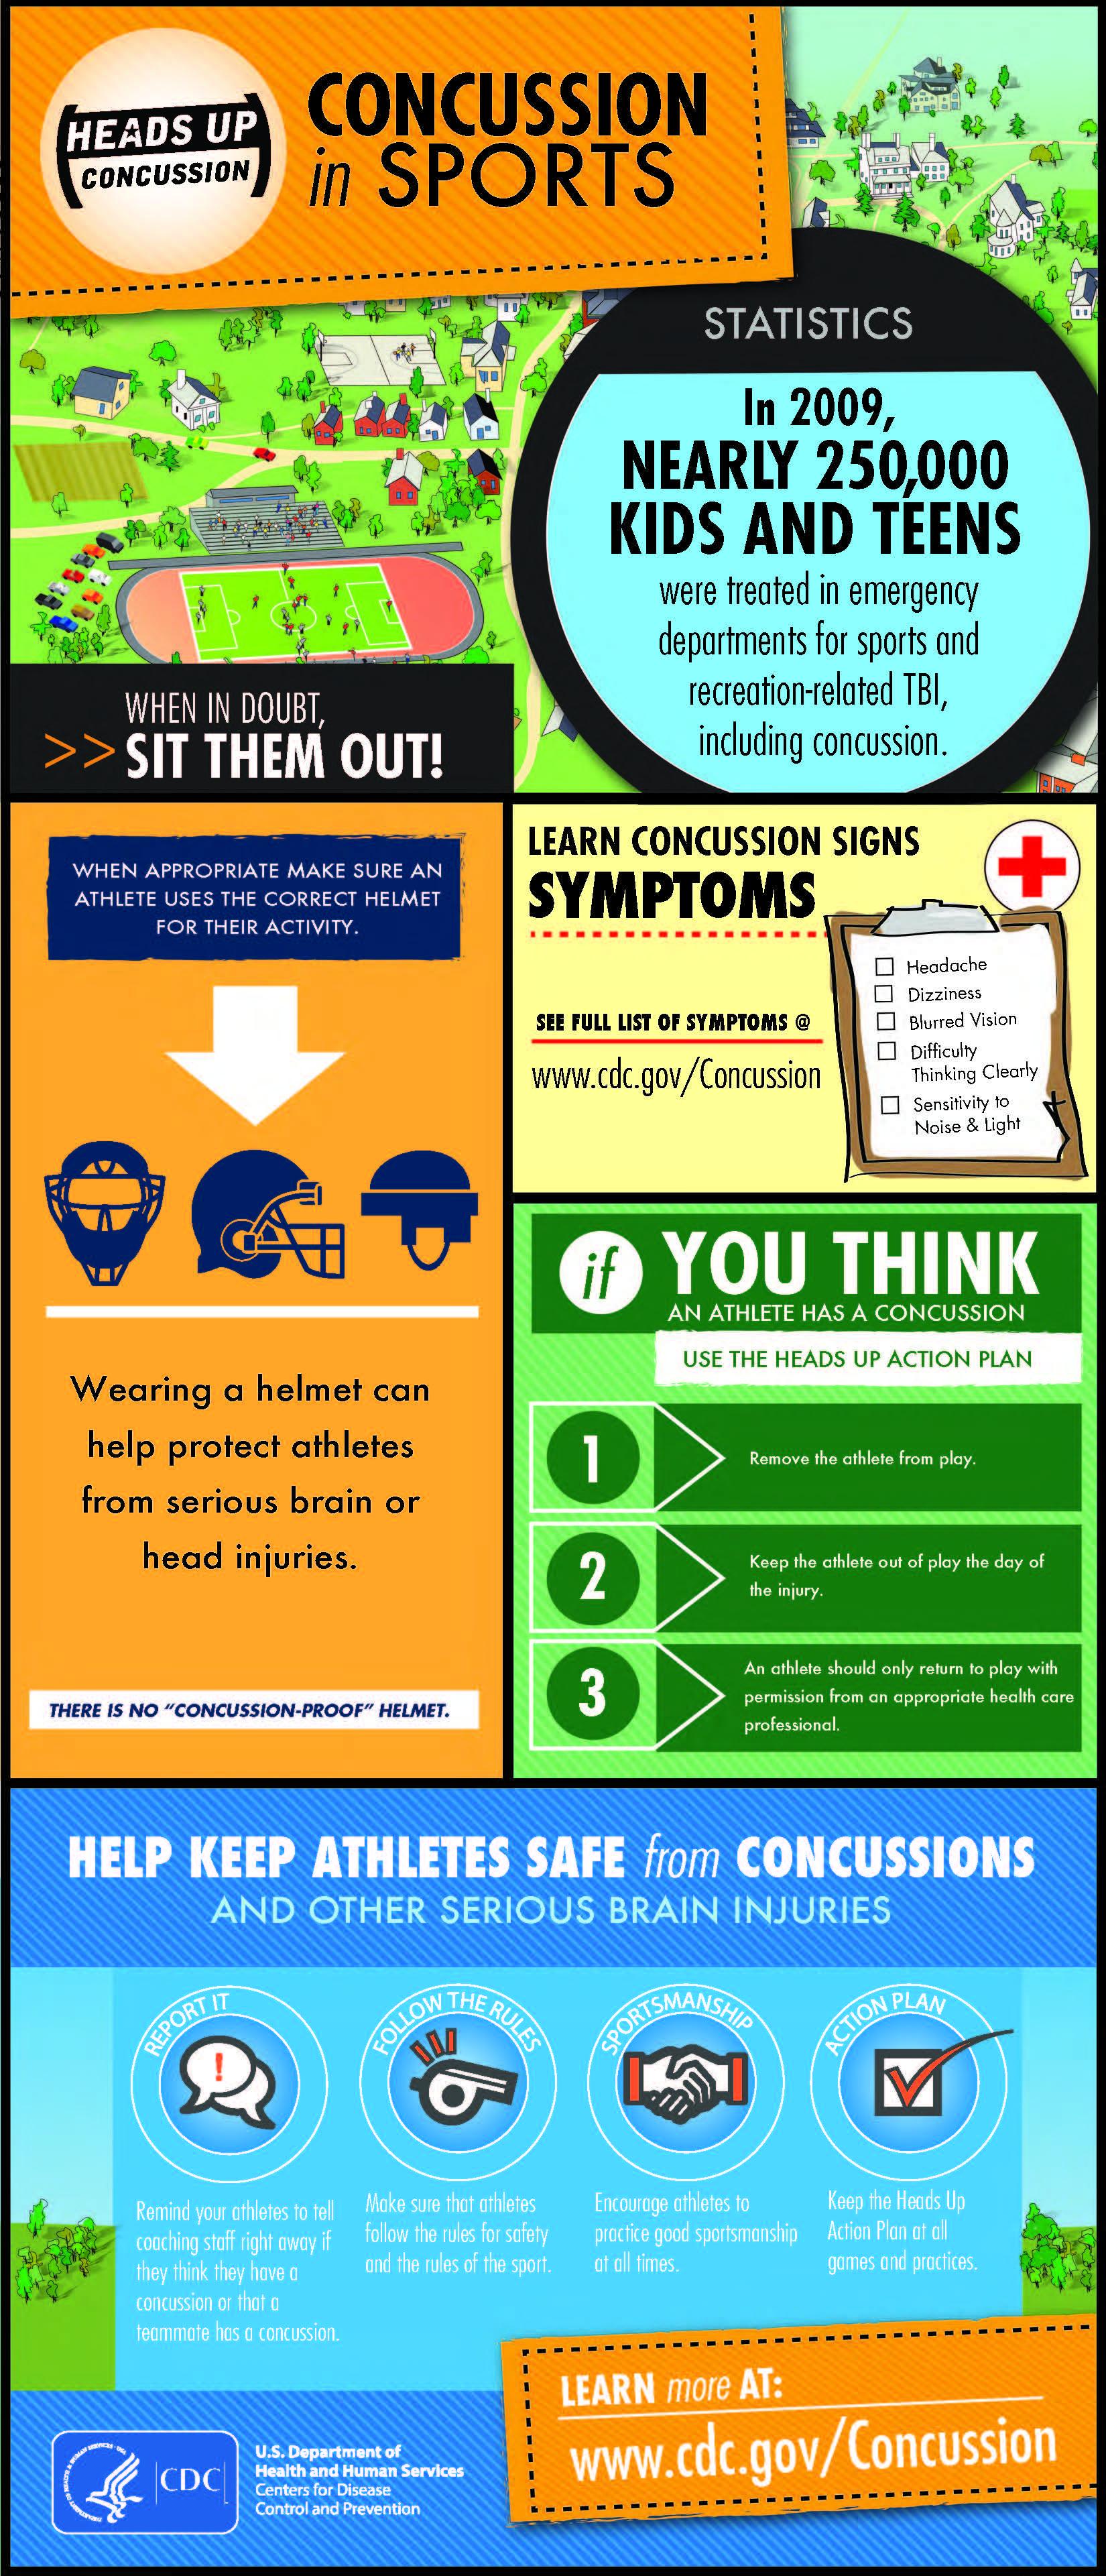 HU_CDC_Sports_infographic-a.jpg